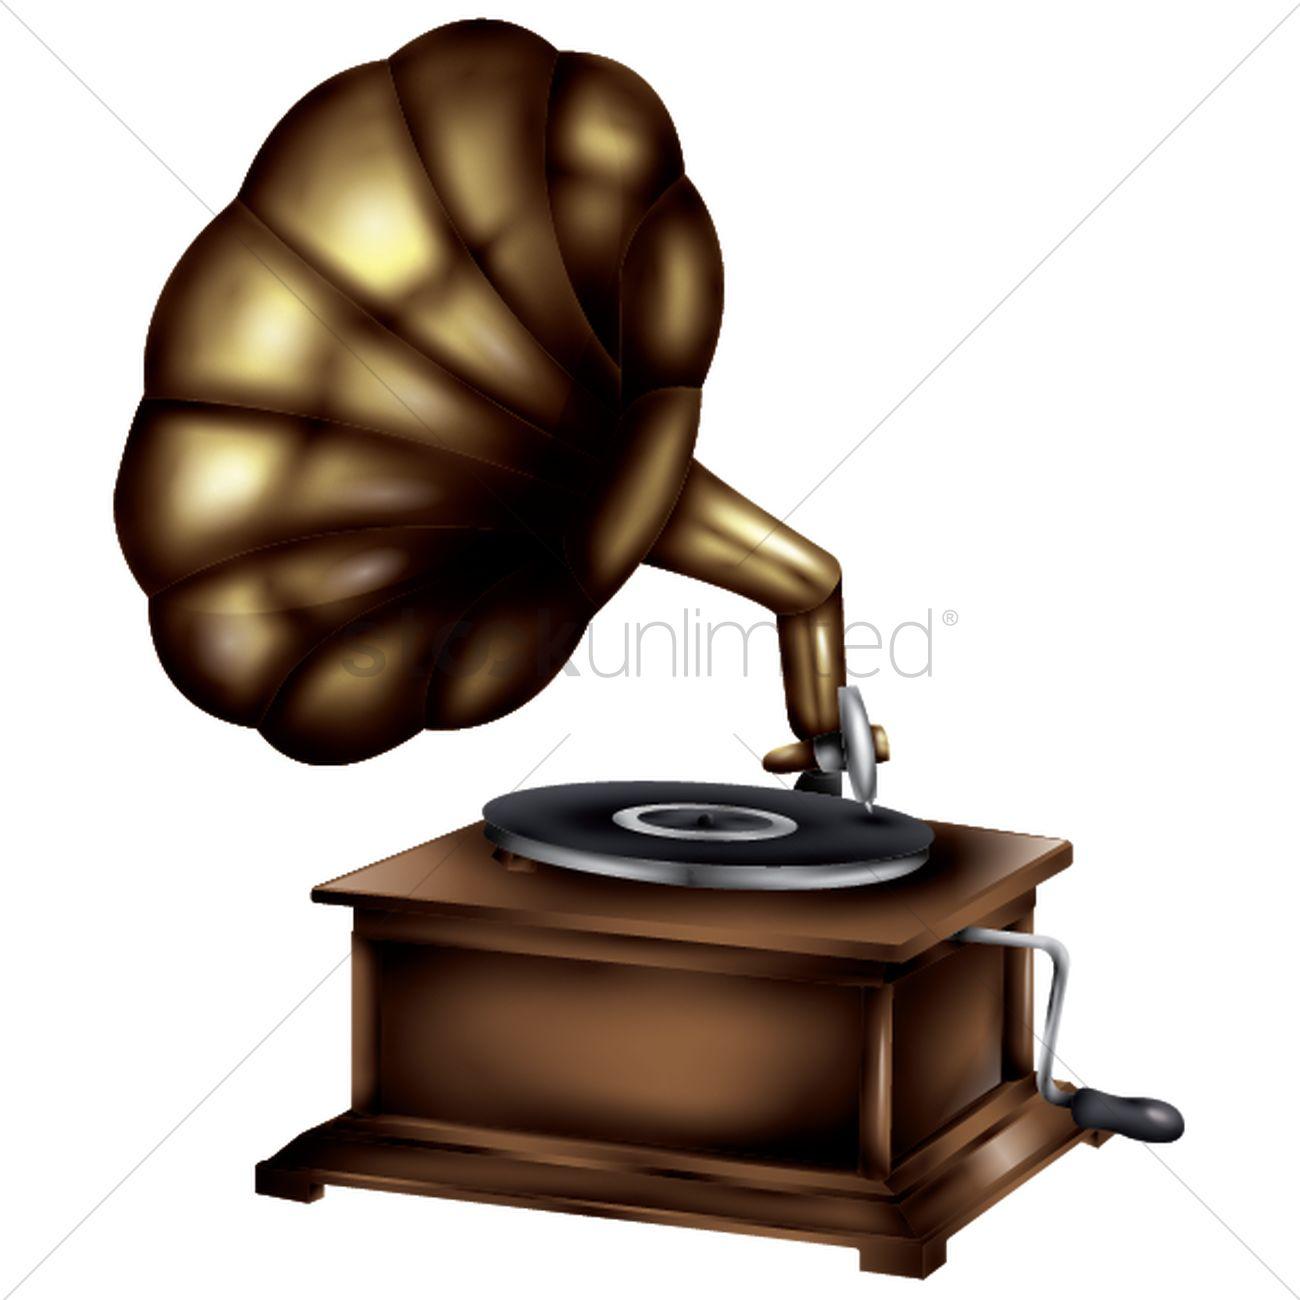 gramophone vector image 1991086 stockunlimited gramophone vector image 1991086